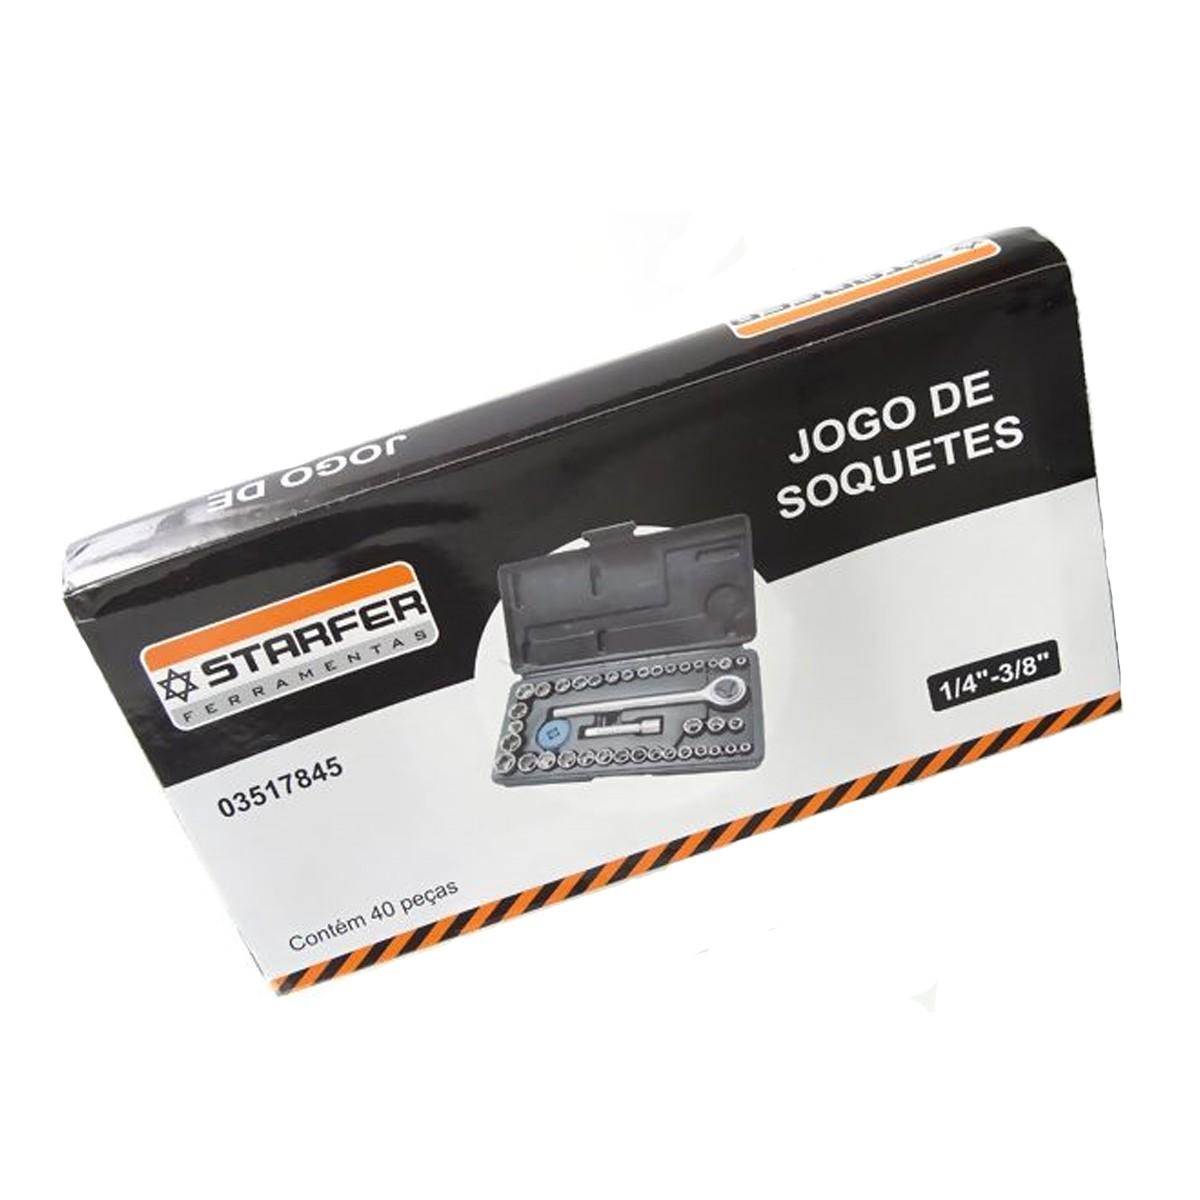 Kit Jogo Ferramentas 48 Pçs Soquete Chave Combinada Starfer